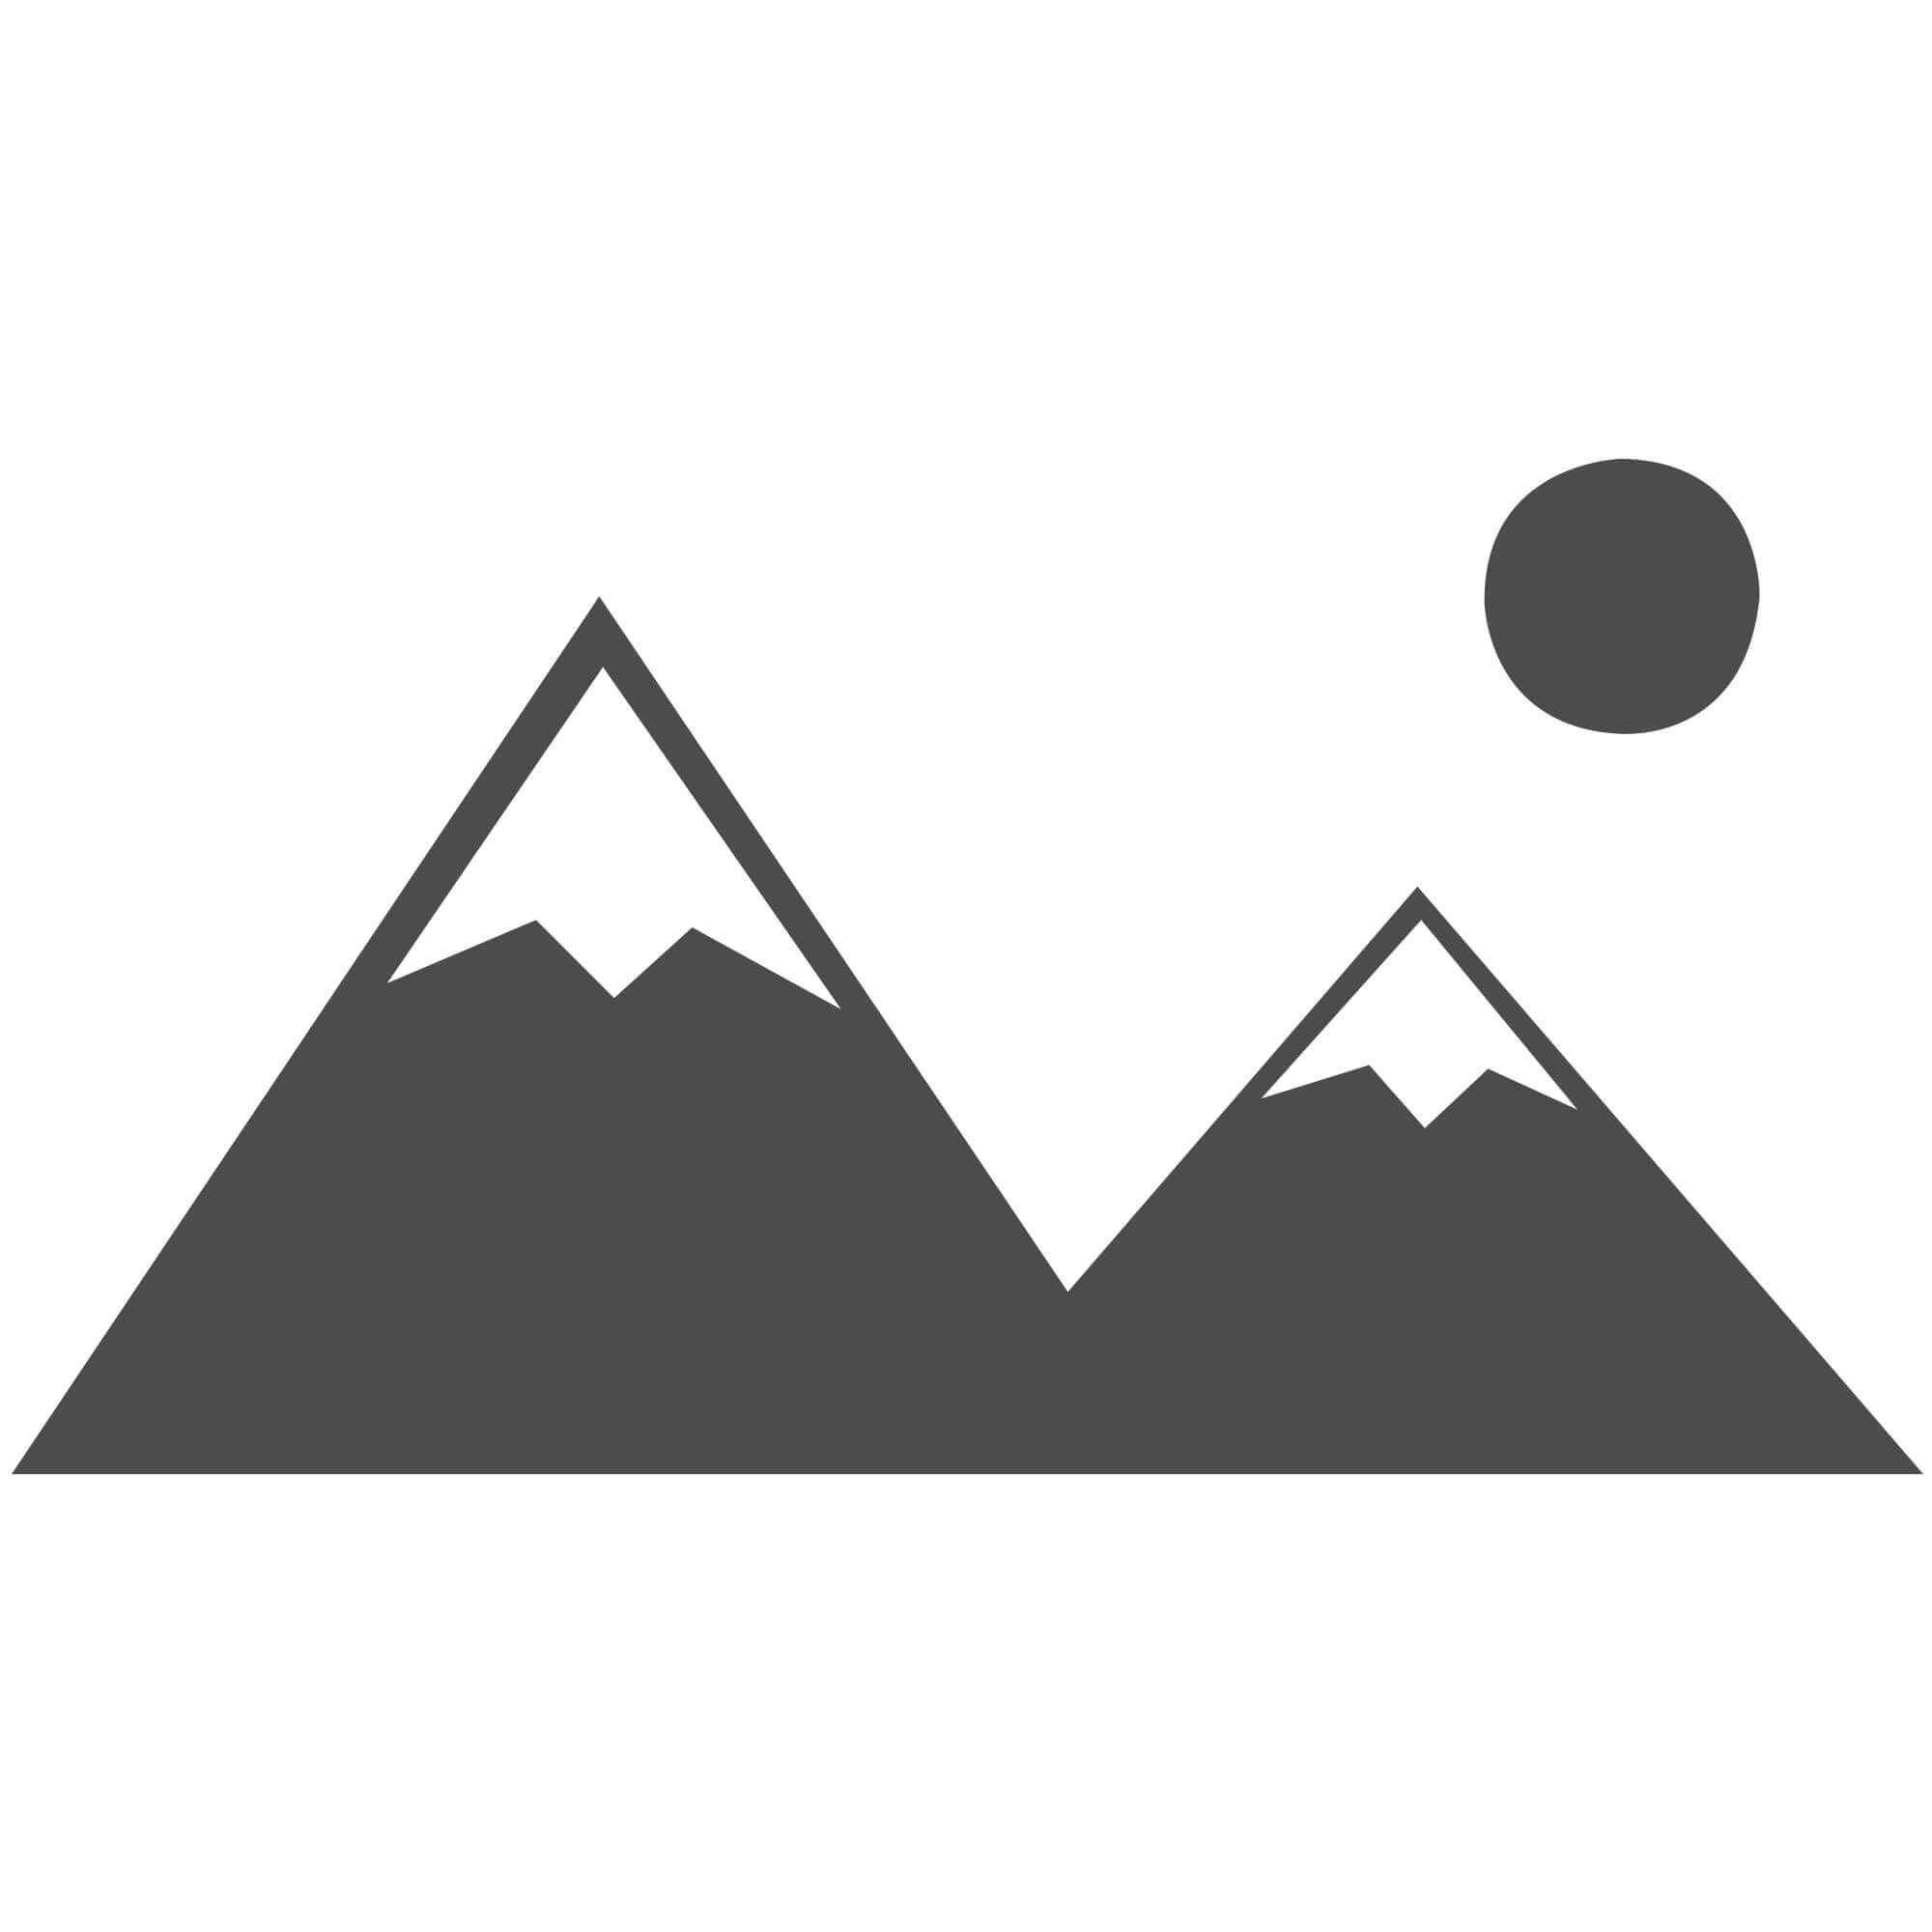 Kashqai Traditional Pazyryk Persian Design Rug 4301 300